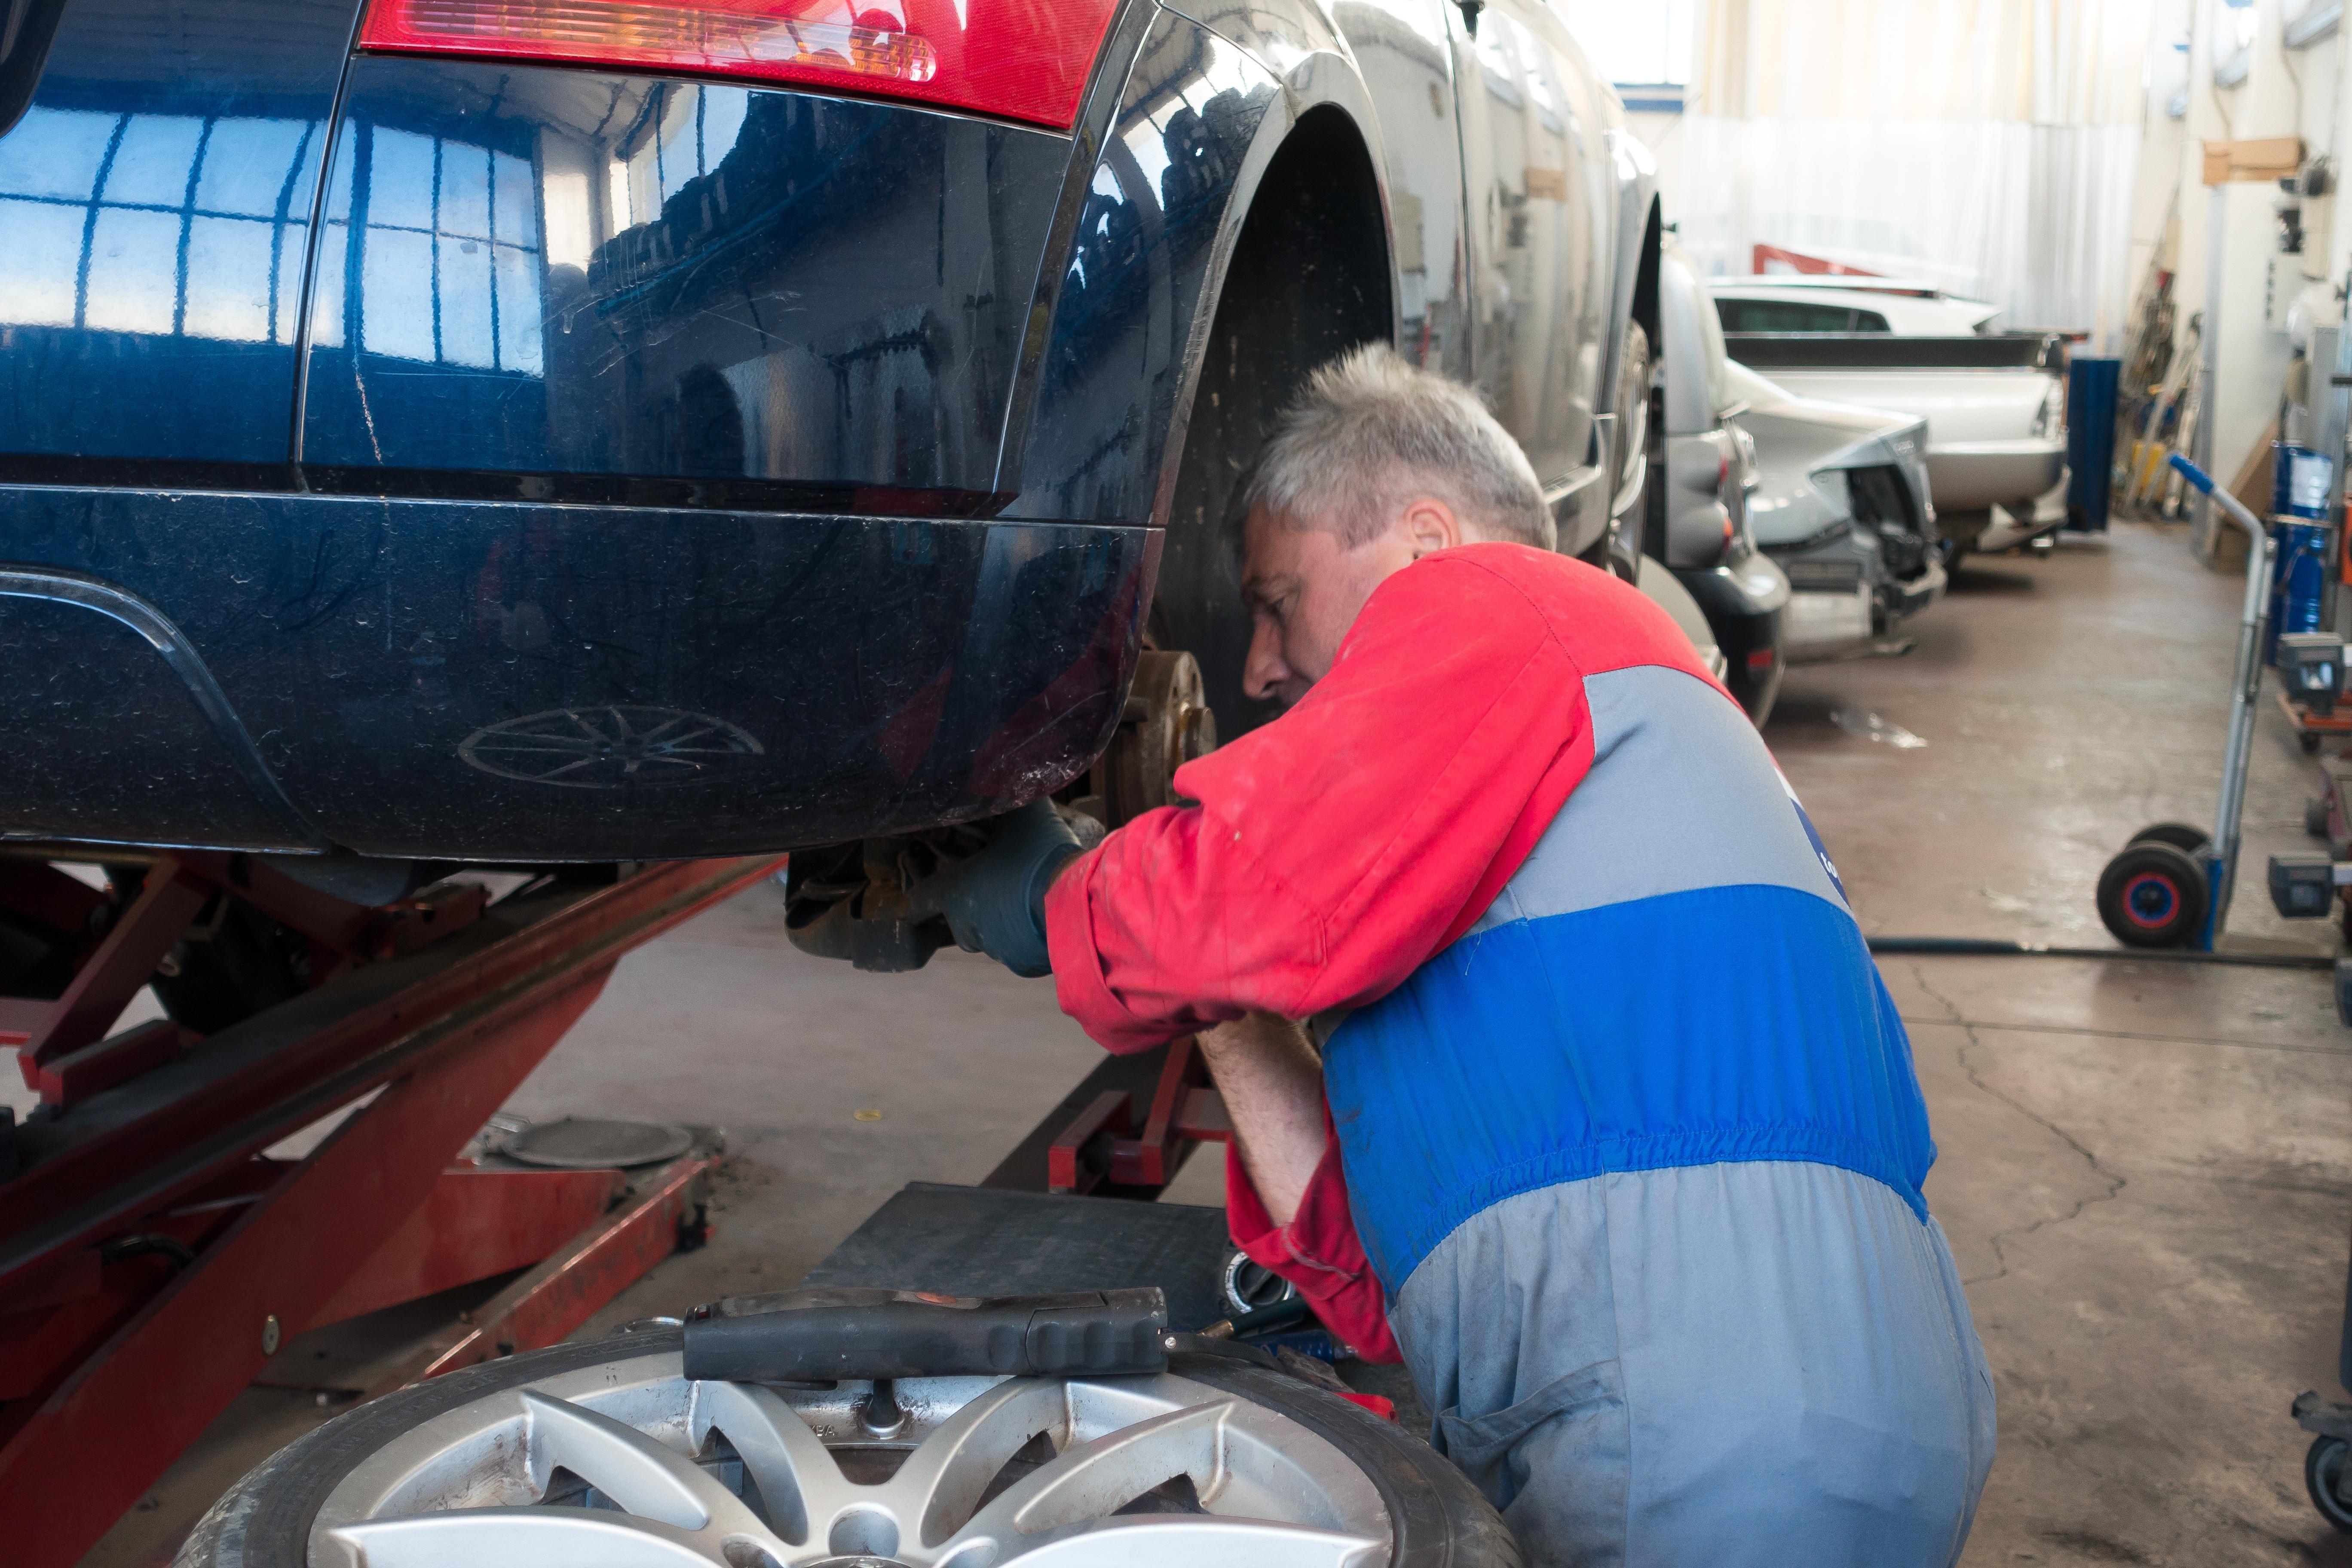 Free Images Wheel Workshop Vehicle Professional Help Lift